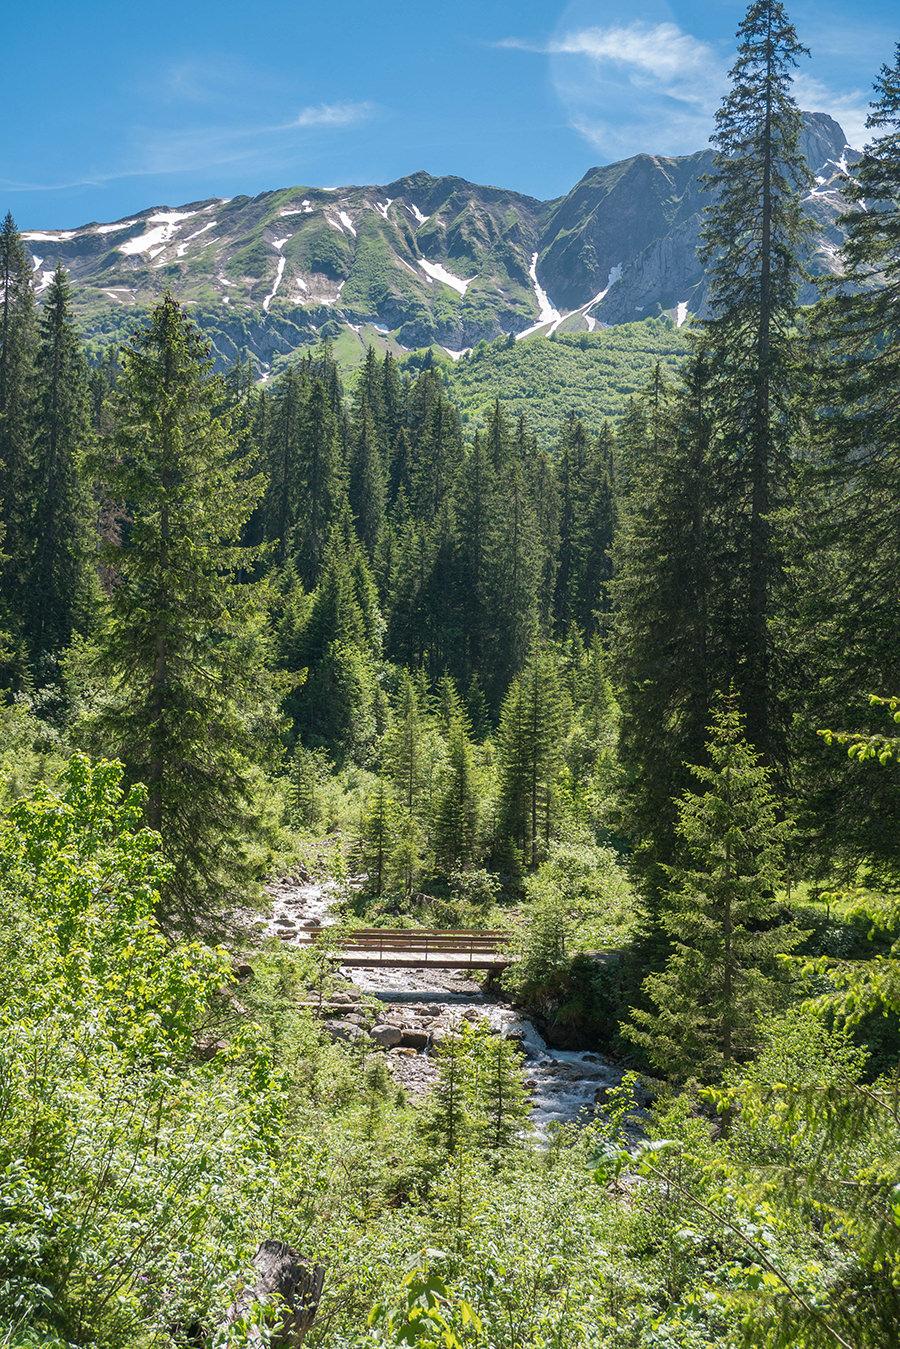 Wanderung im Baergunttal - Bruecke